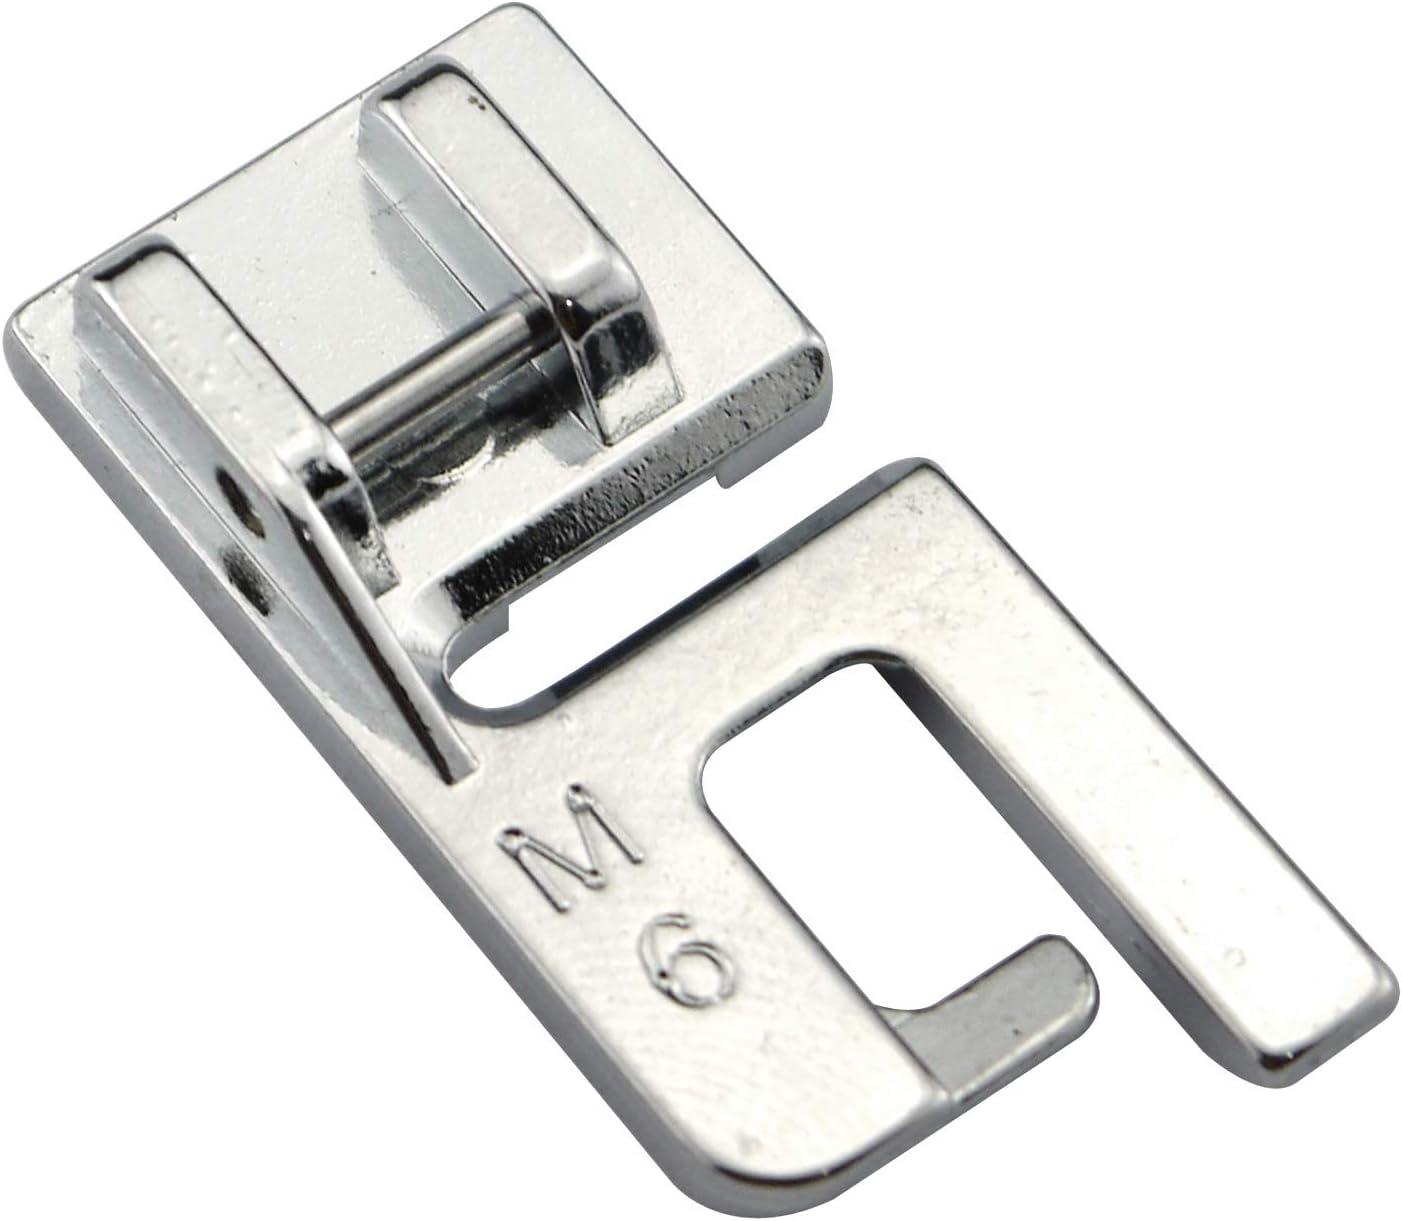 DREAMSTITCH P60973 - Prensatelas para máquina de coser Elna (6 mm ...